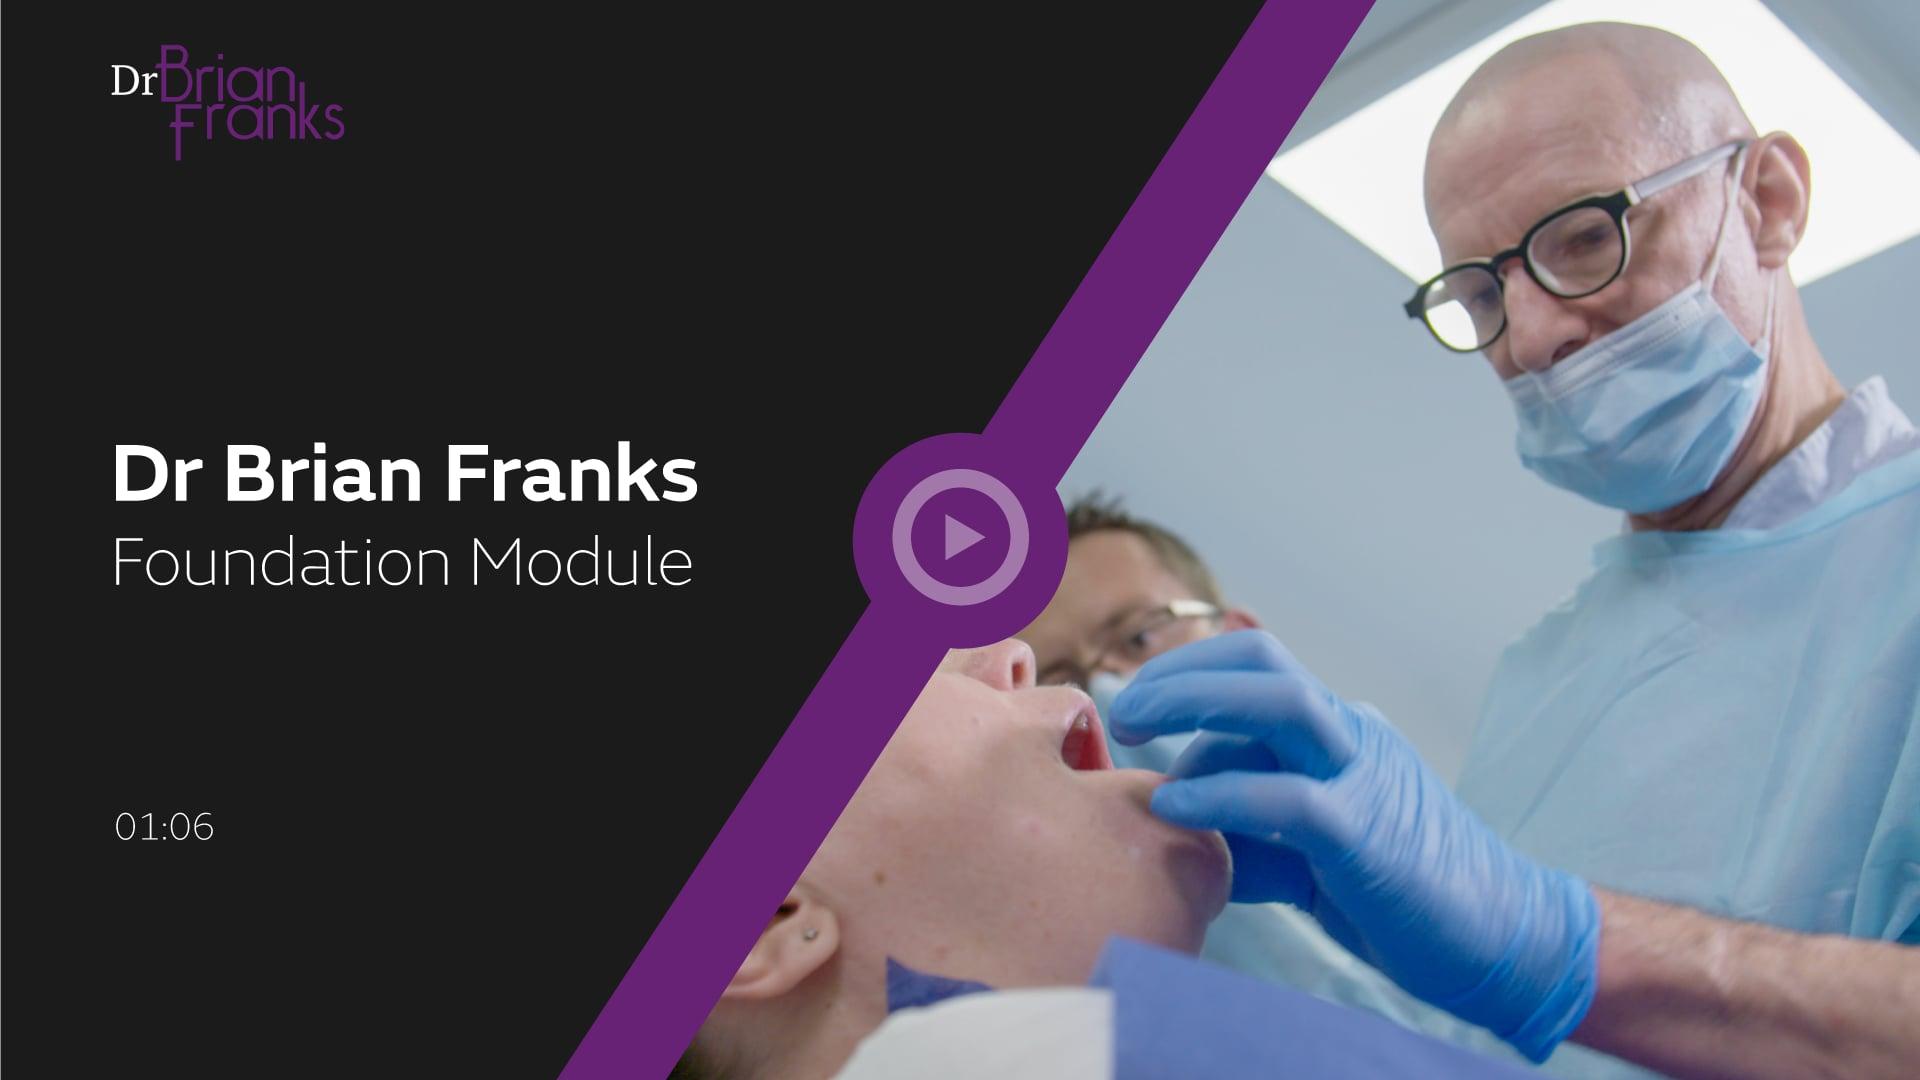 Dr Brian Franks - Facial Aesthetic Training